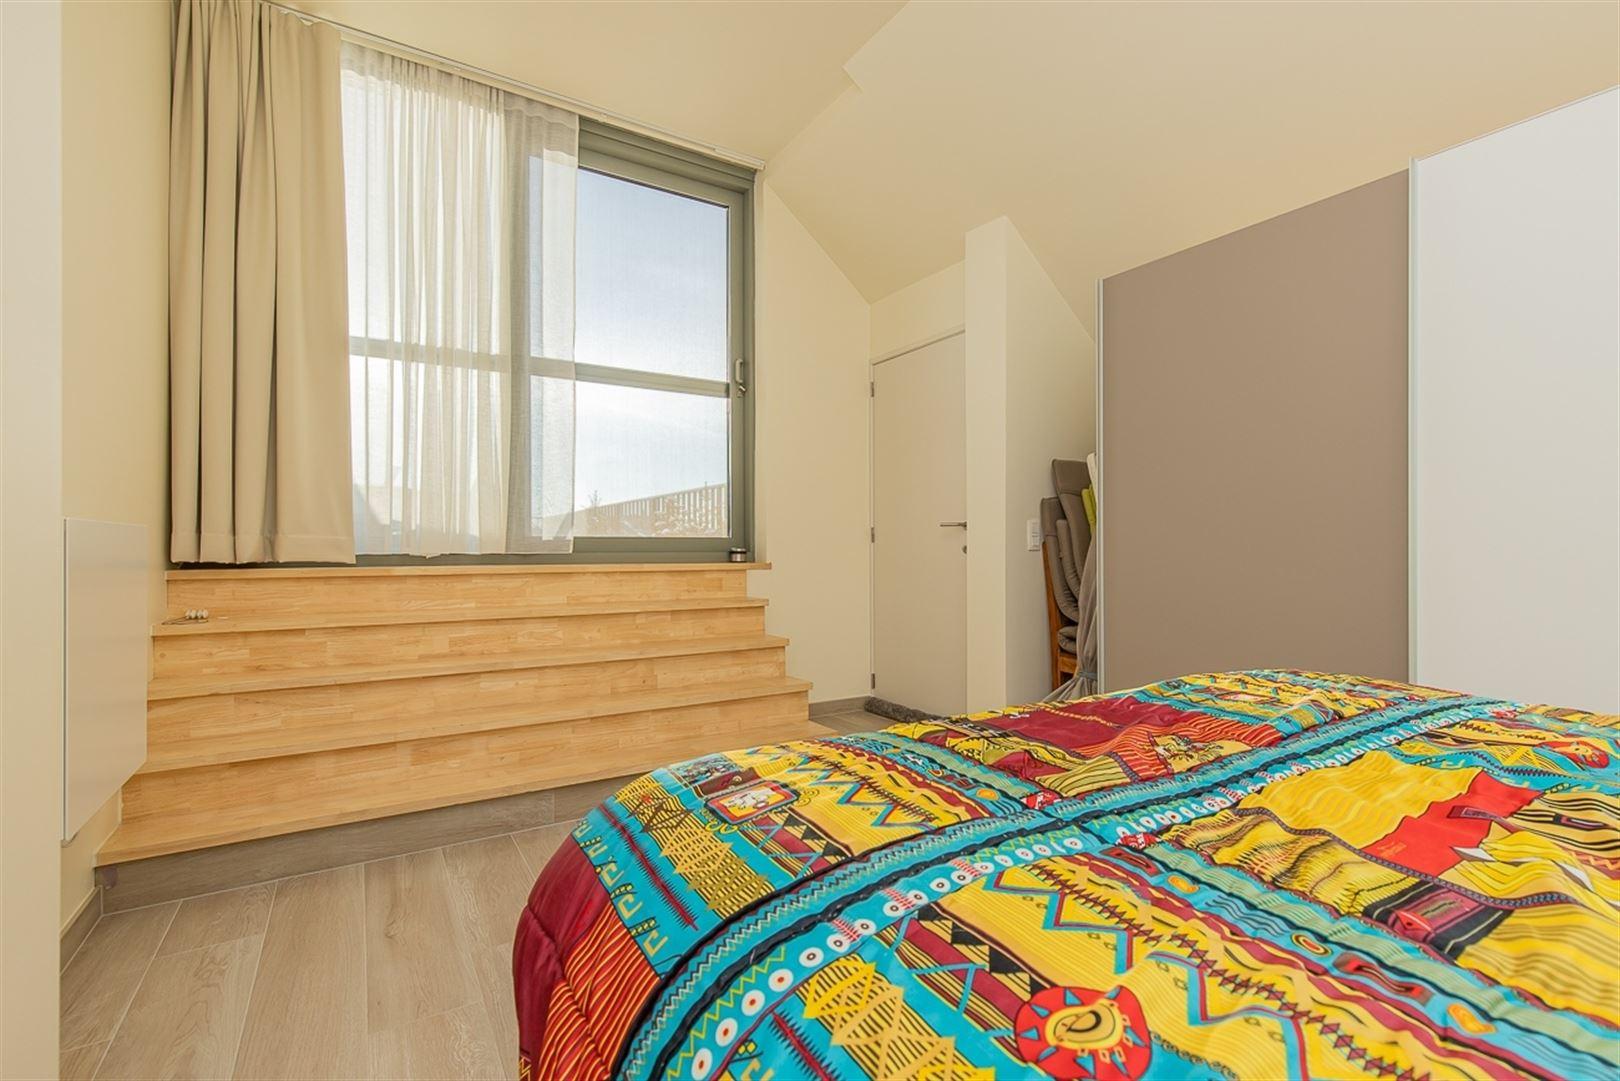 Foto 16 : Duplex/Penthouse te 9200 DENDERMONDE (België) - Prijs € 399.000